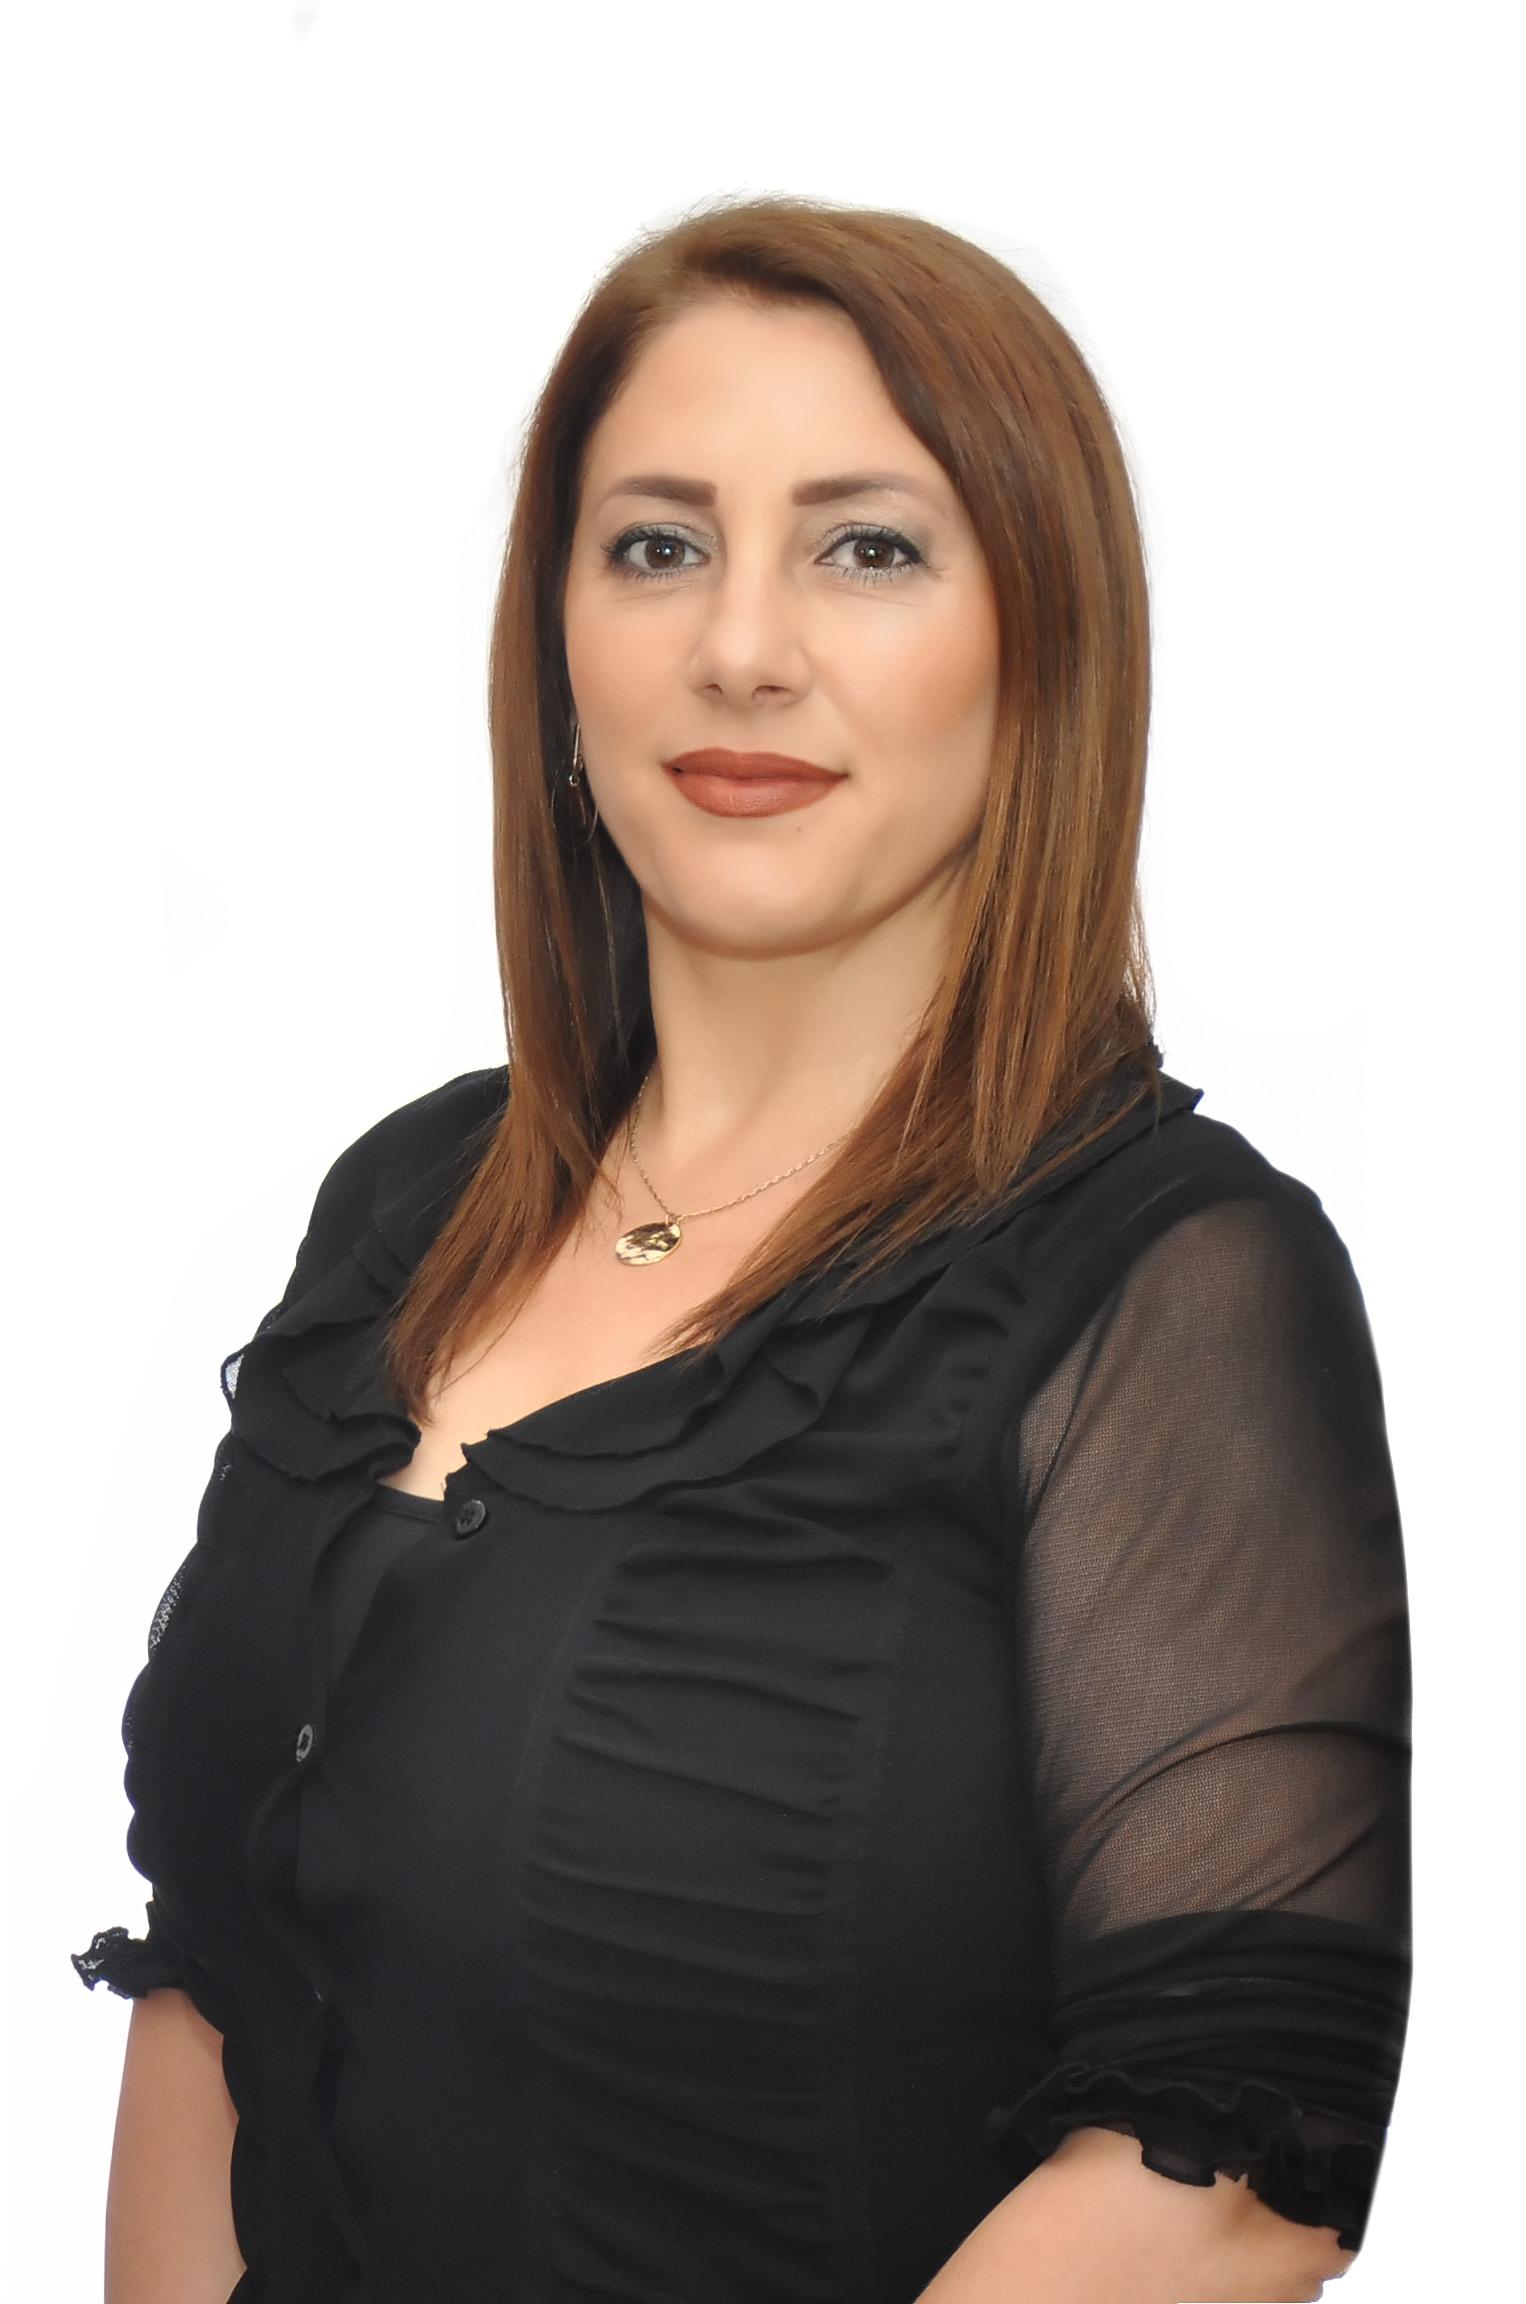 Merita Lleshaj